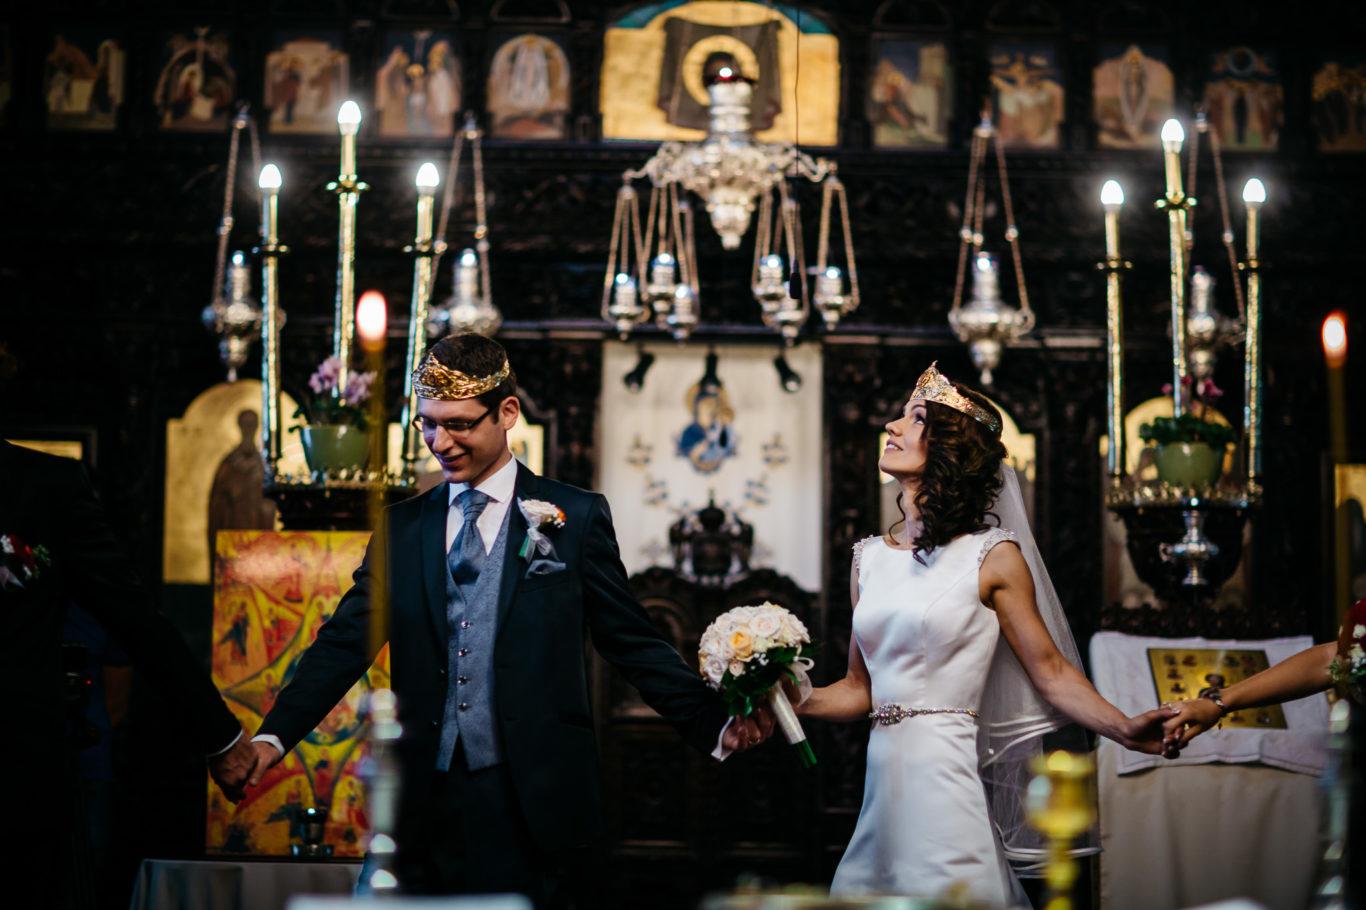 0479-fotografie-nunta-bucuresti-dana-radu-fotograf-ciprian-dumitrescu-cd2_7481